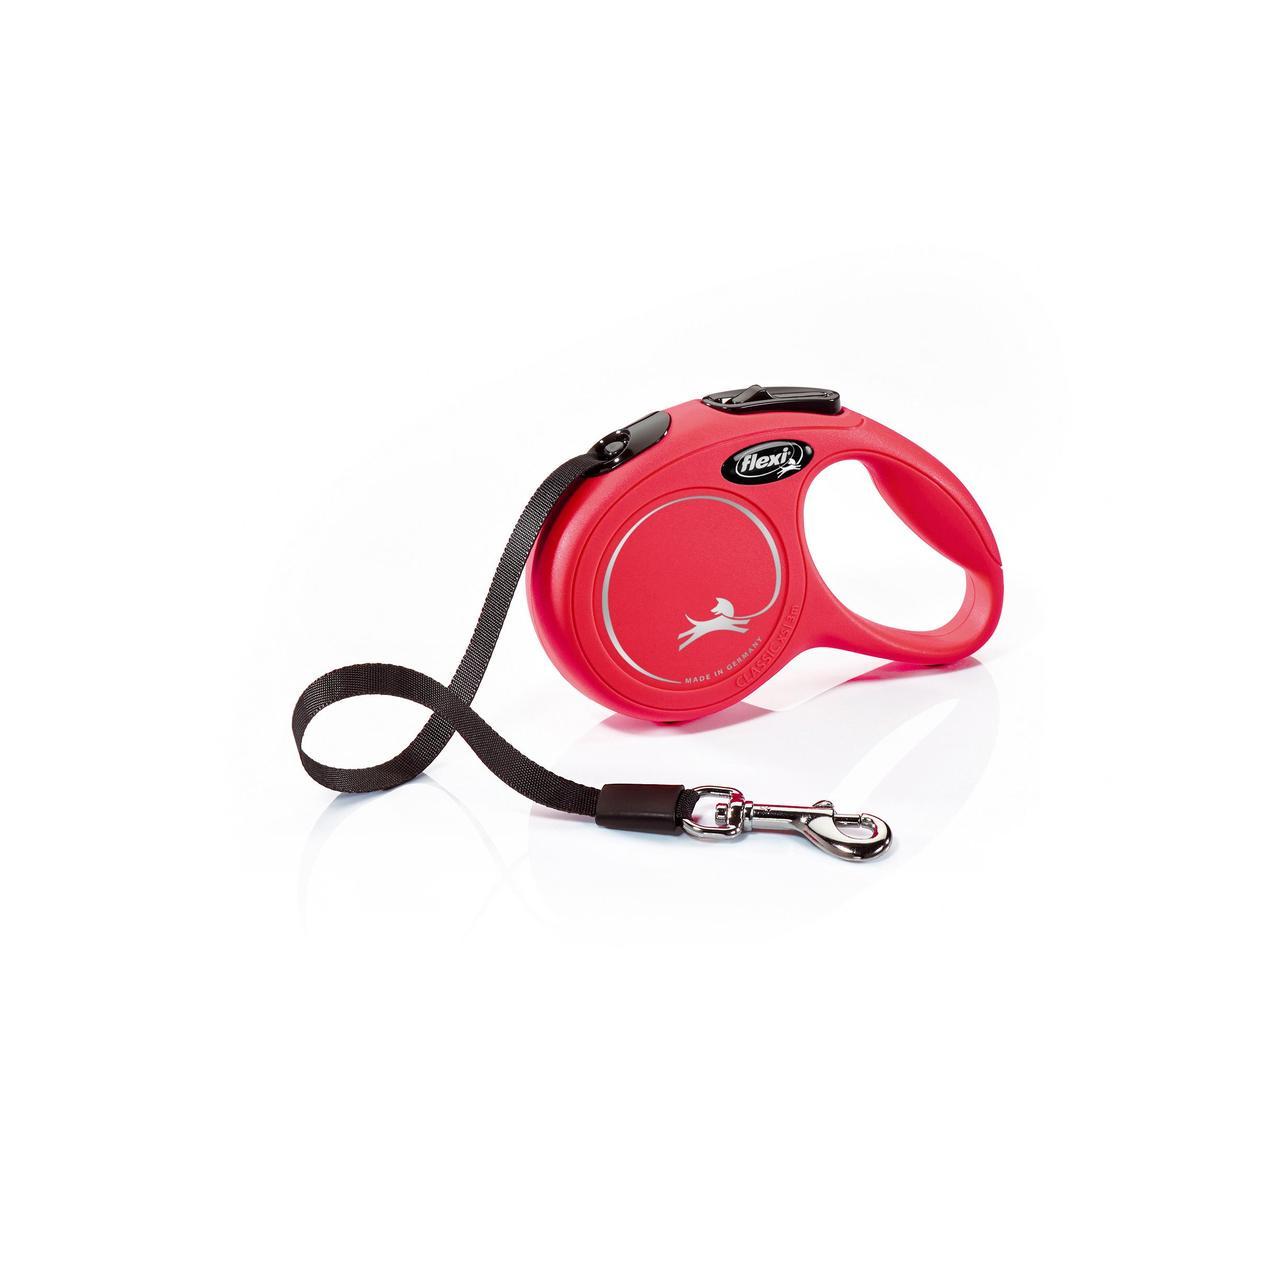 Поводок-рулетка Flexi с лентой New Classic XS 3 м / 12 кг красная